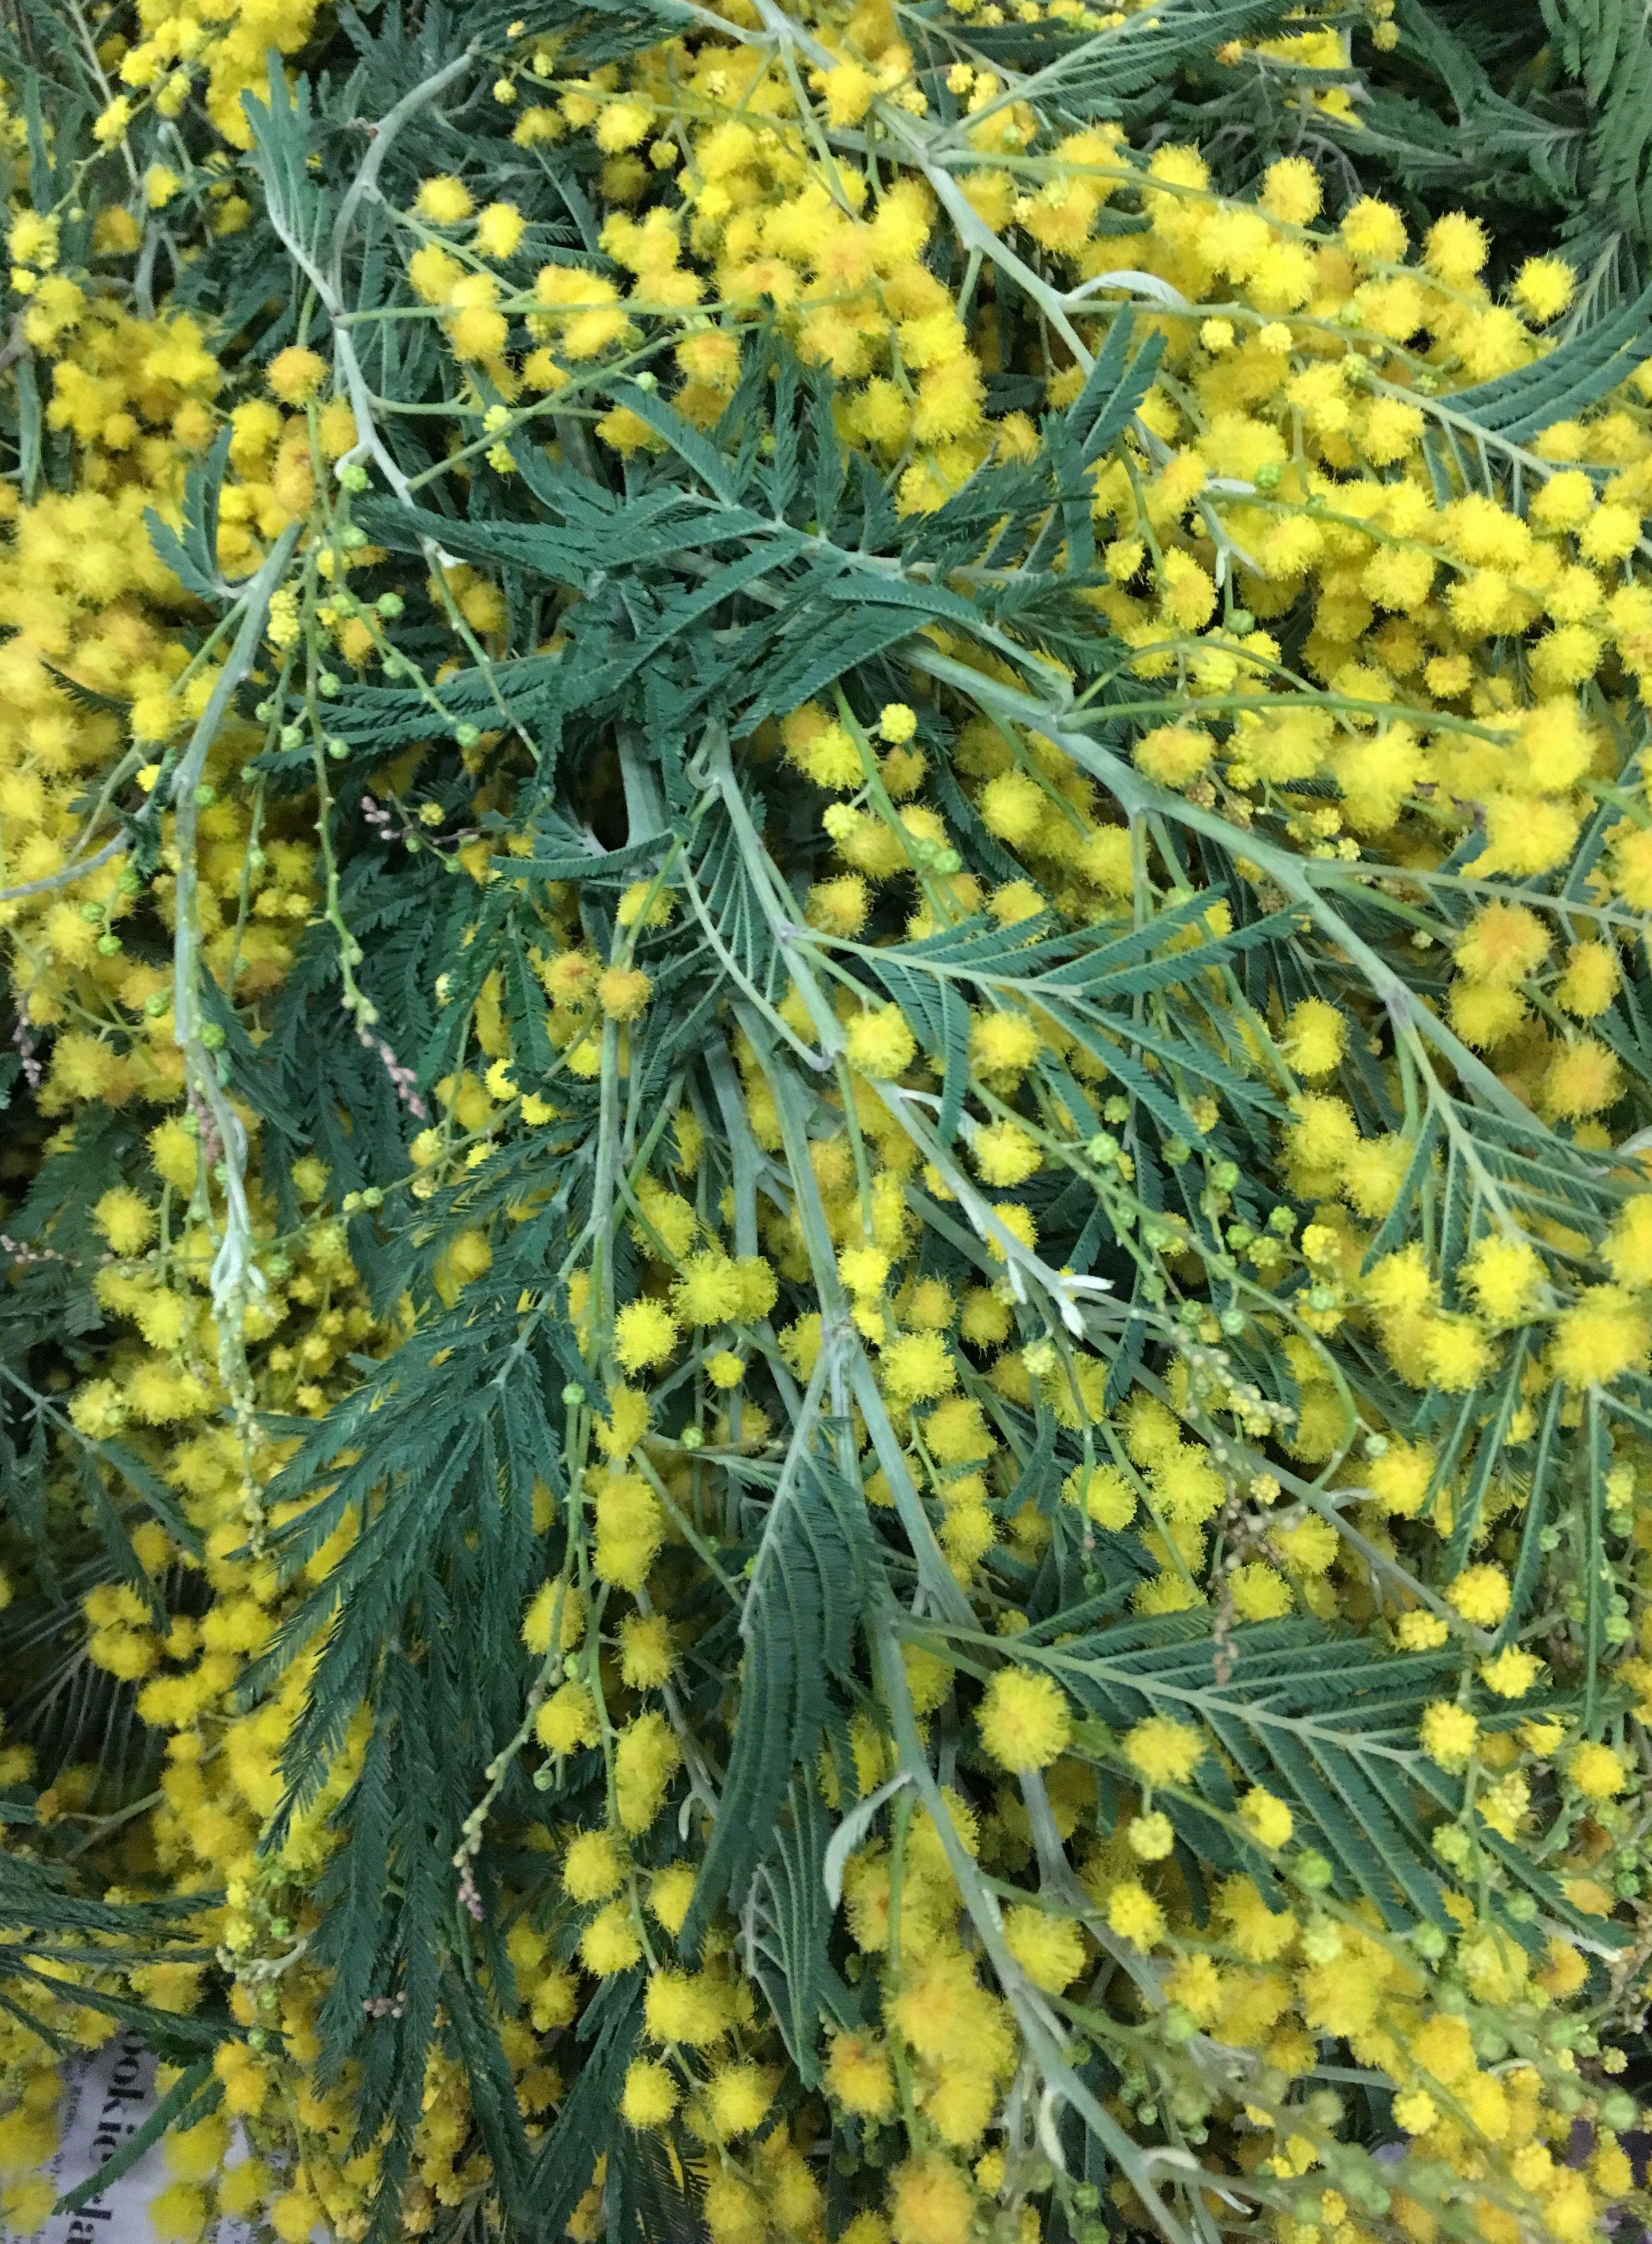 Soft Yellow California Acacia Plant Leaves Green Flowers Florist Supplies